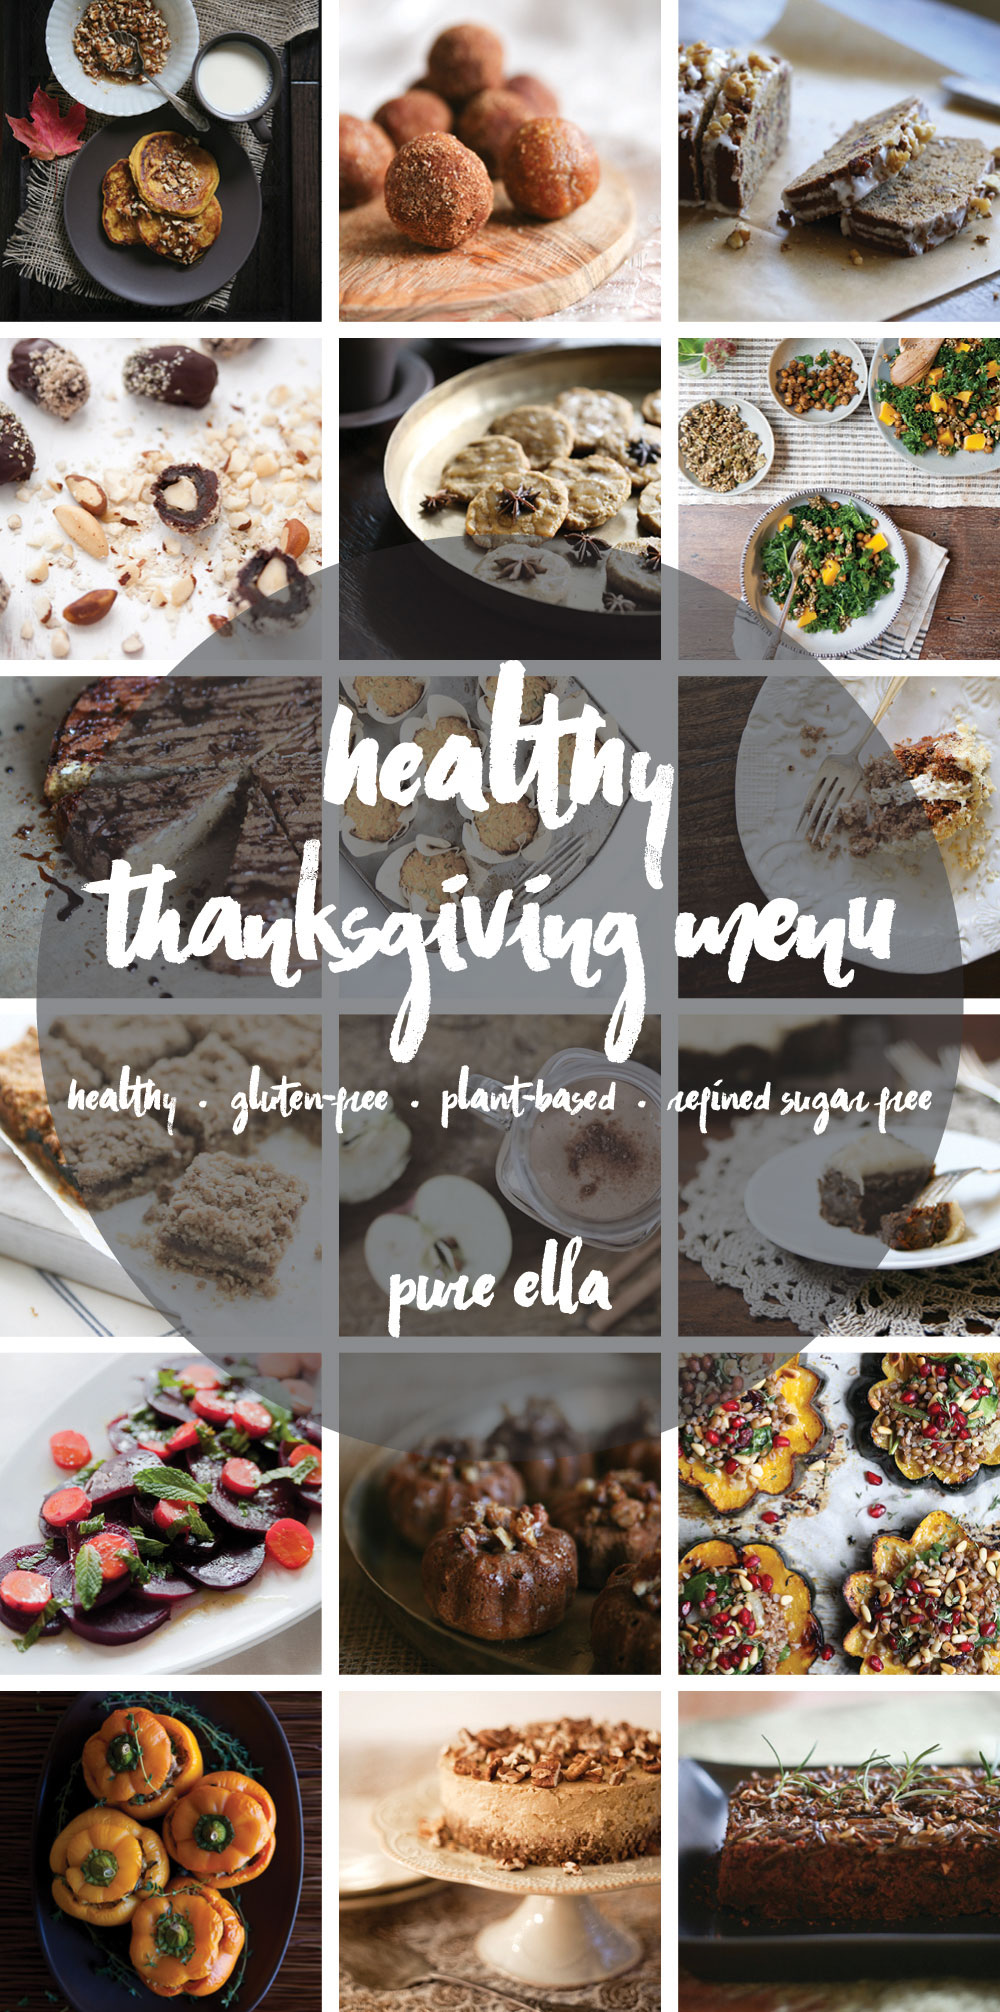 healthy-thanksgiving-menu-pure-ella-leche